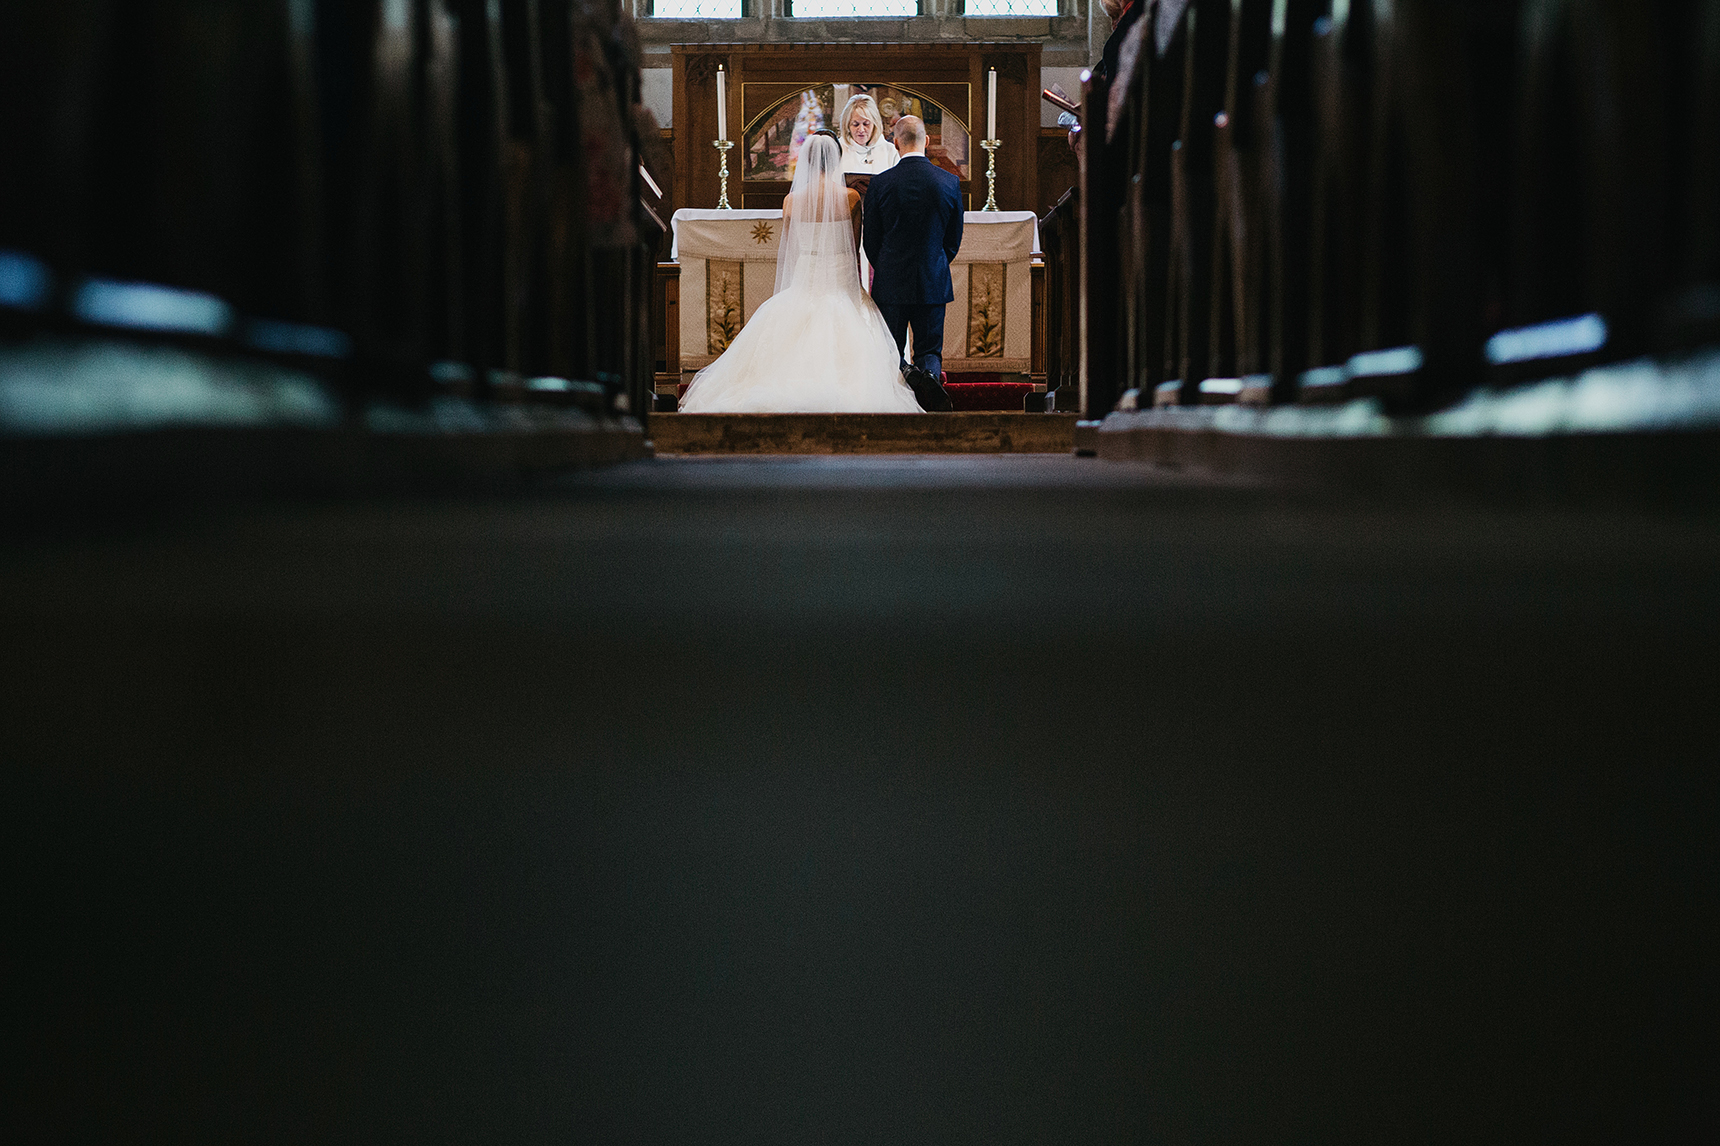 easby abbey weddings